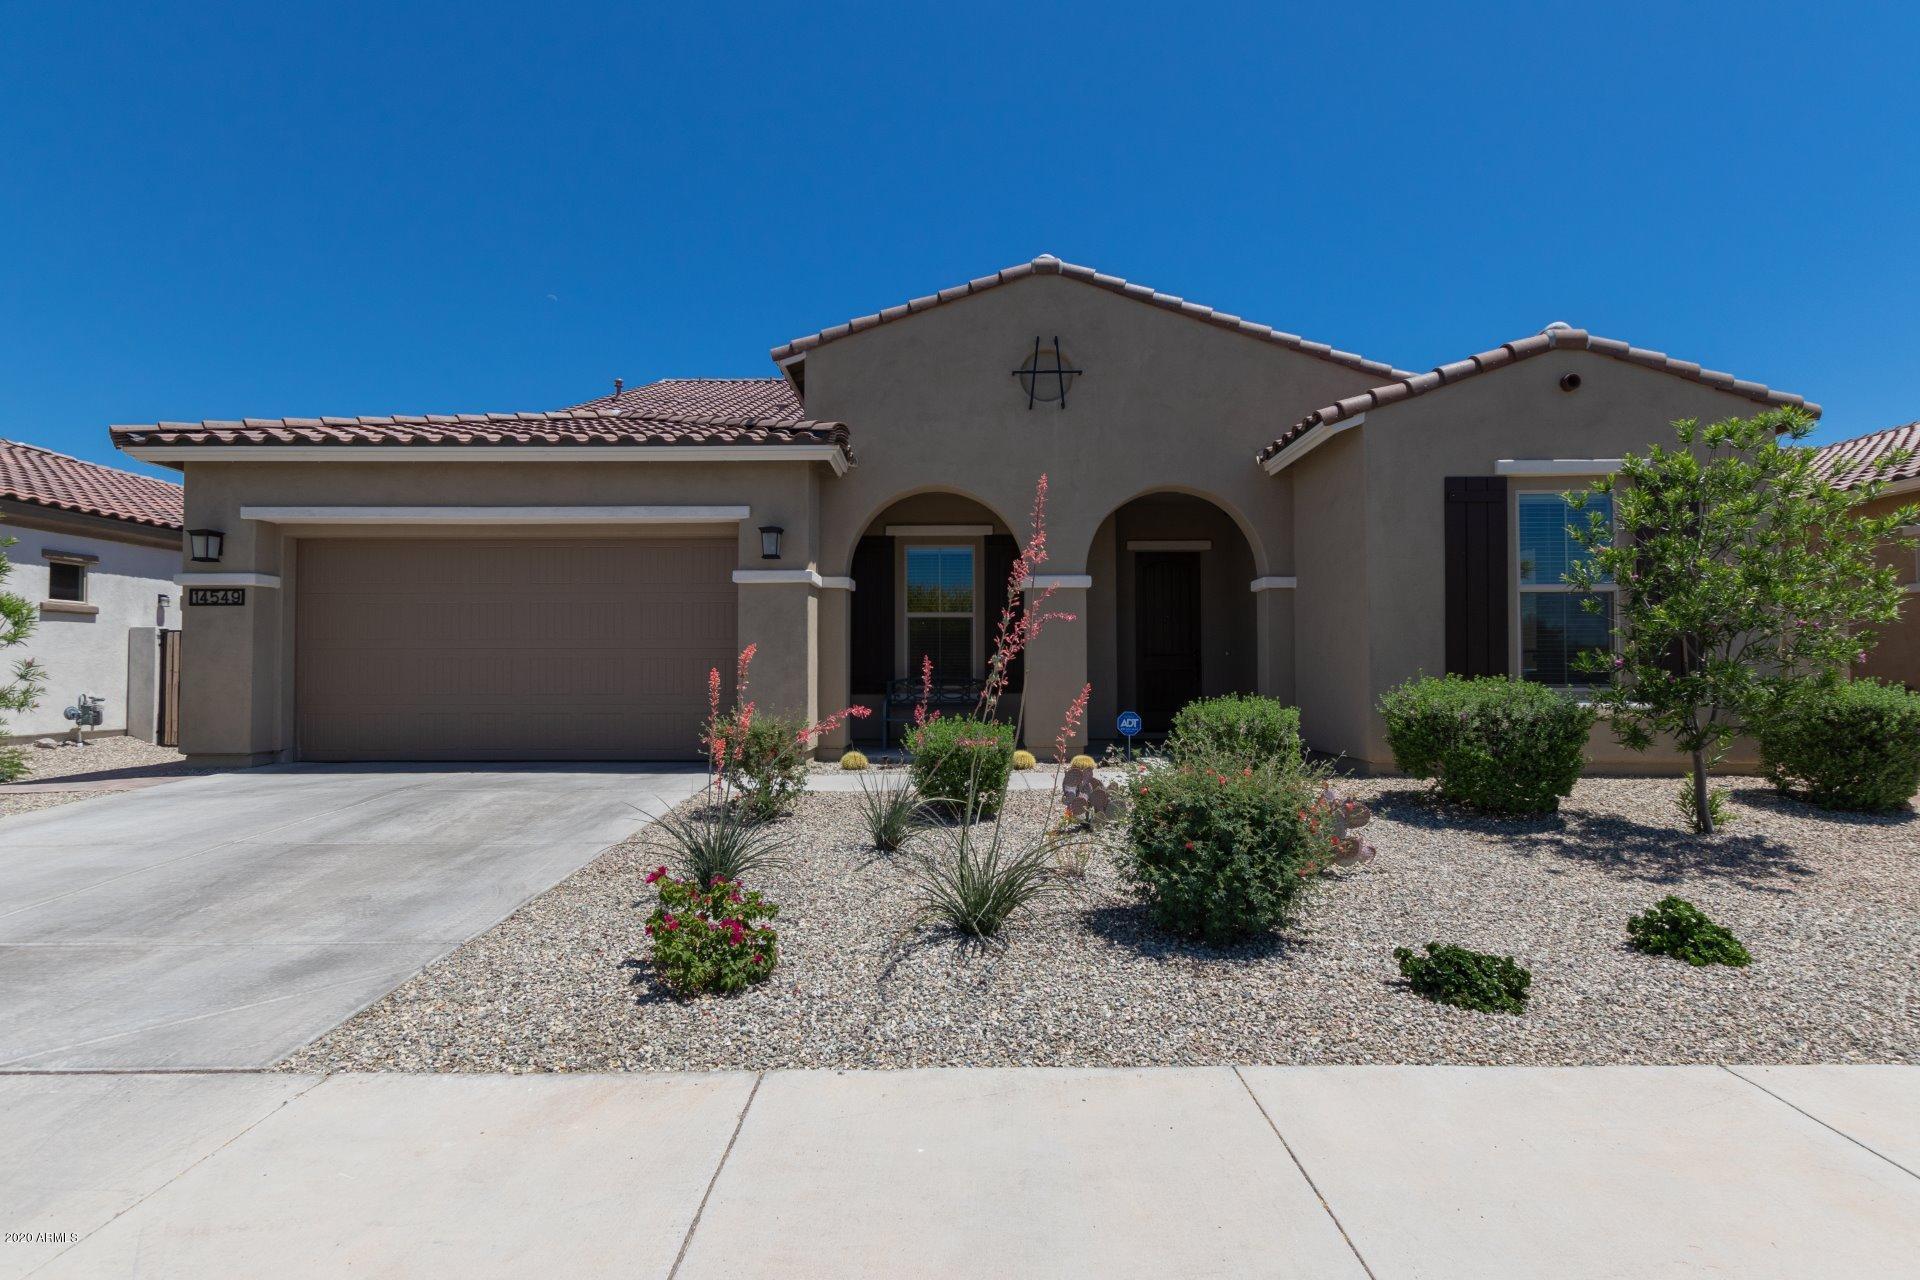 Photo of 14549 S 178TH Drive, Goodyear, AZ 85338